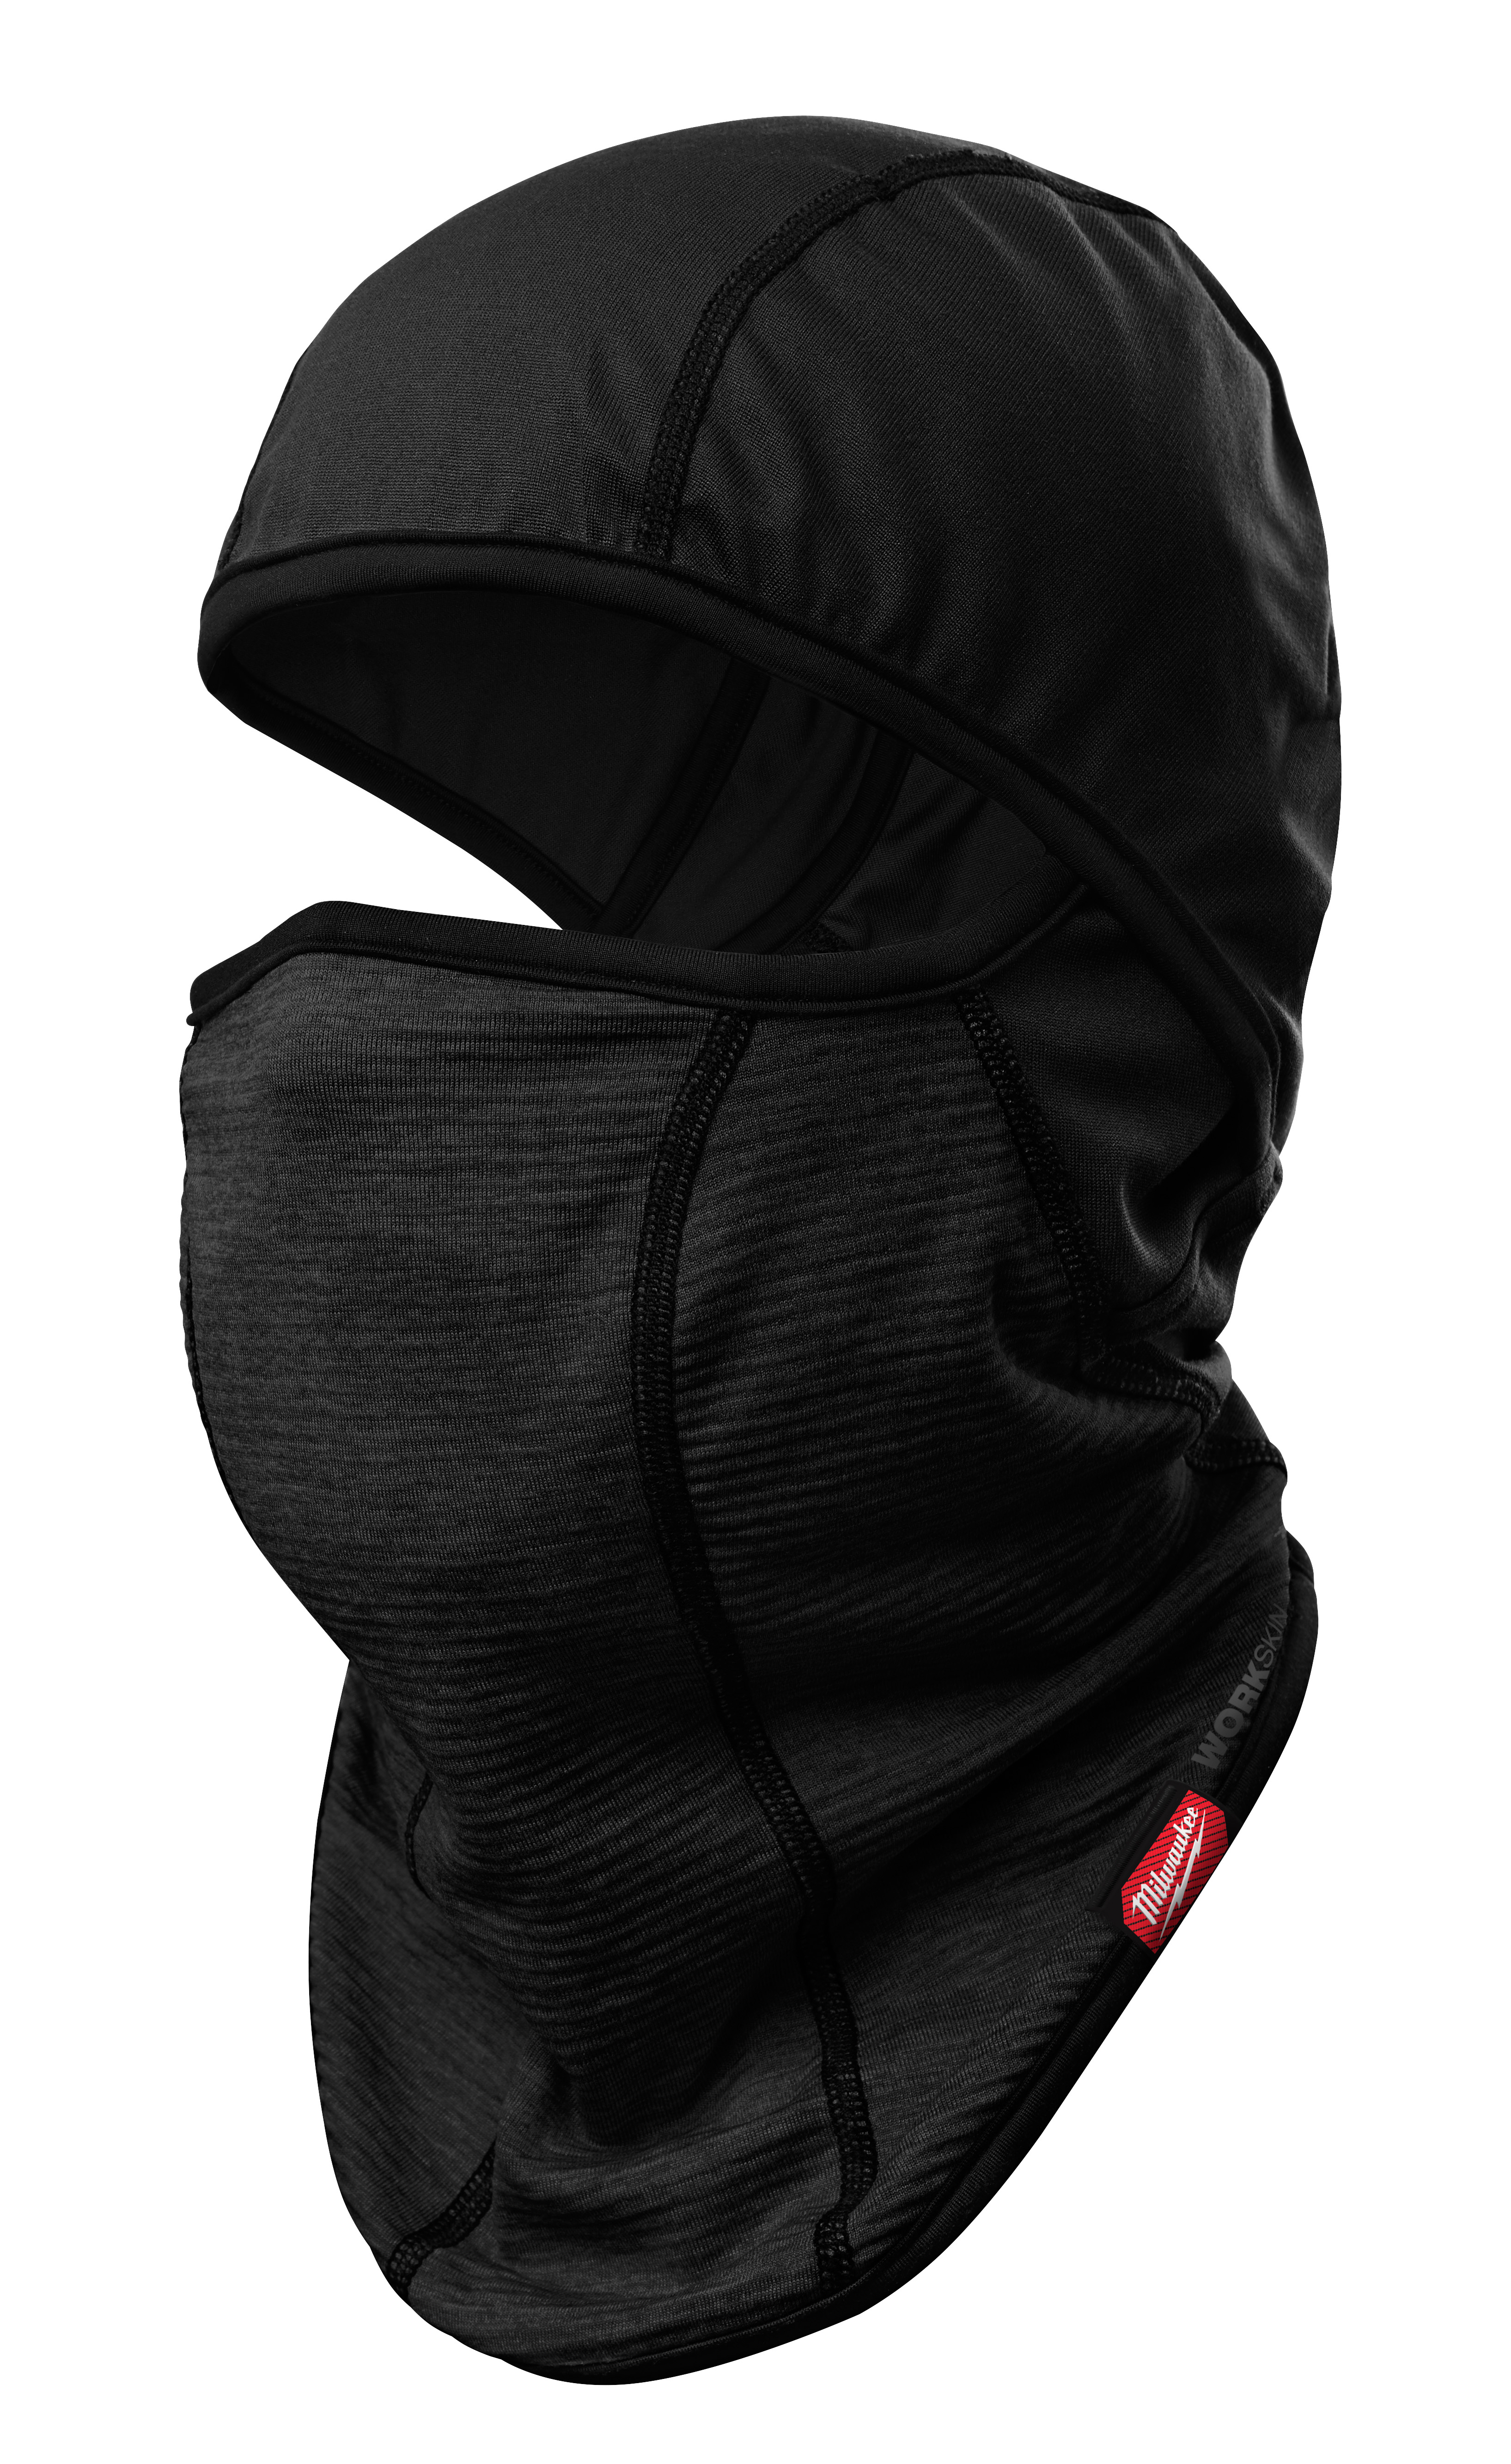 Milwaukee® WORKSKIN™ 421B Mid-Weight Cold Weather Balaclava, Universal, Black, Fabric